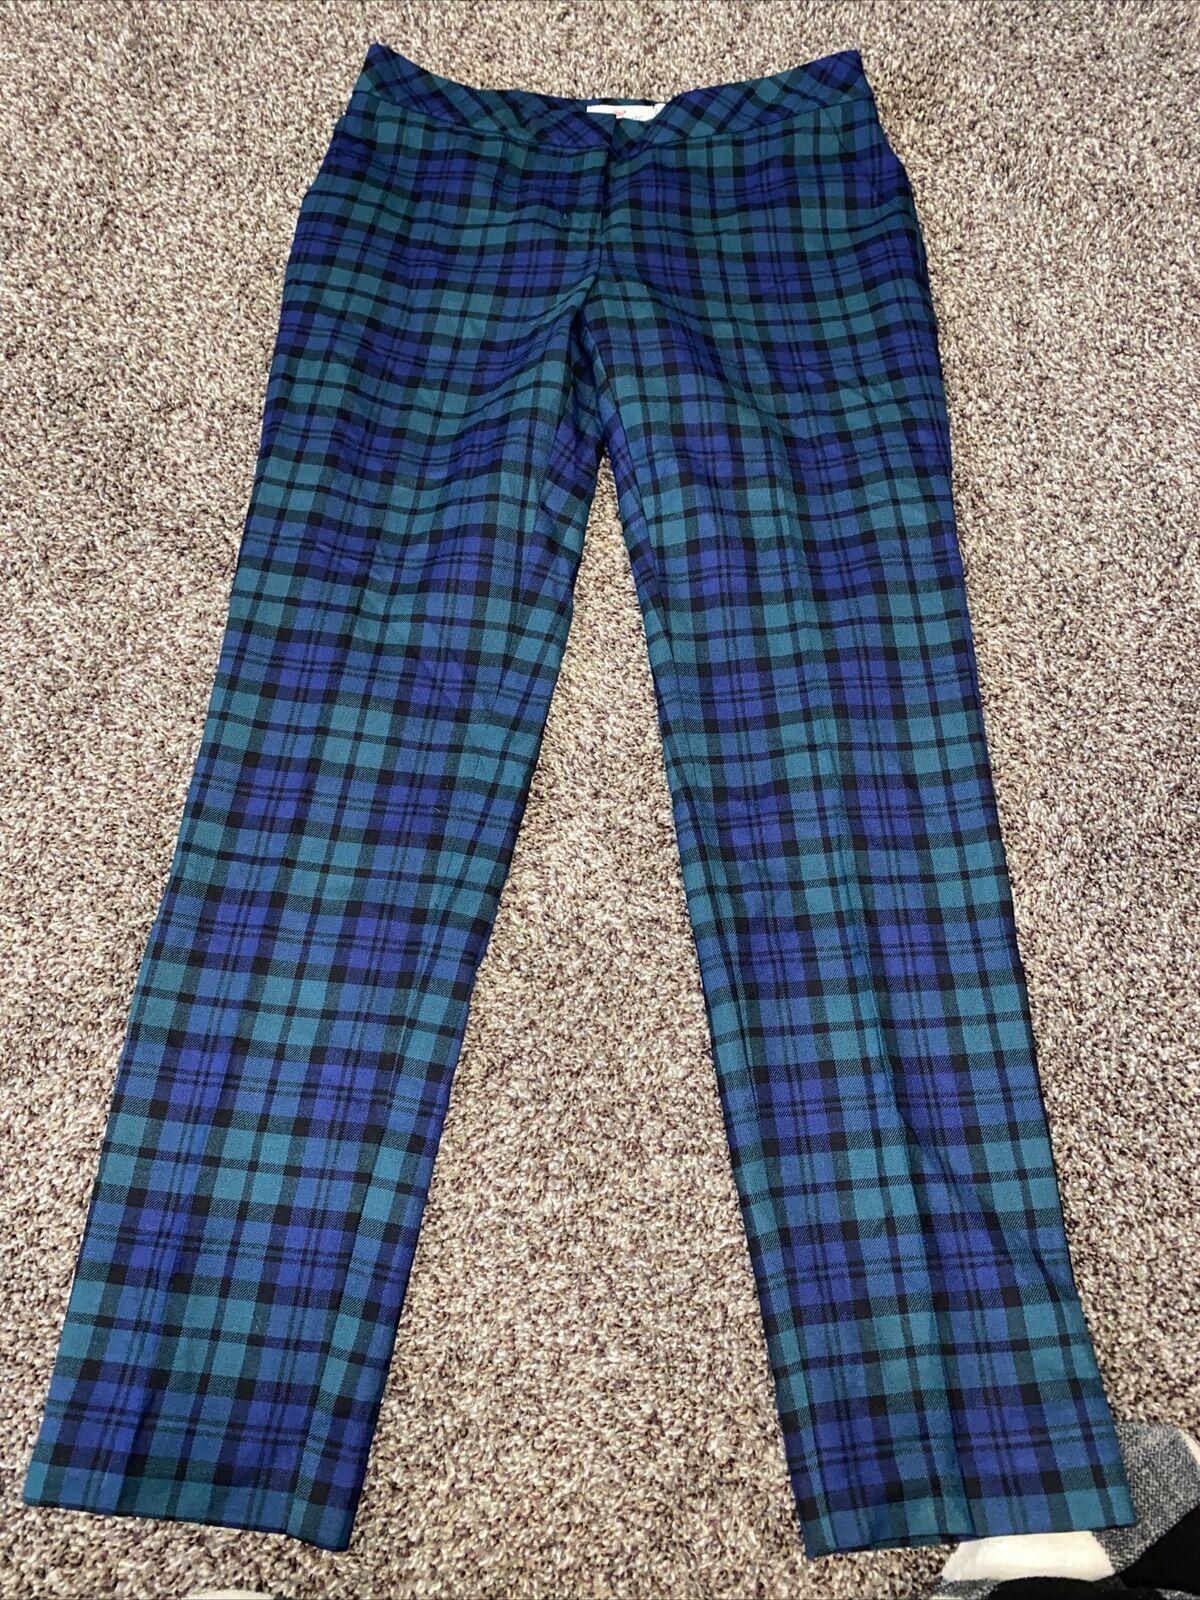 Womens Vineyard Vines Plaid Pants Size 2 Dress Pa… - image 3